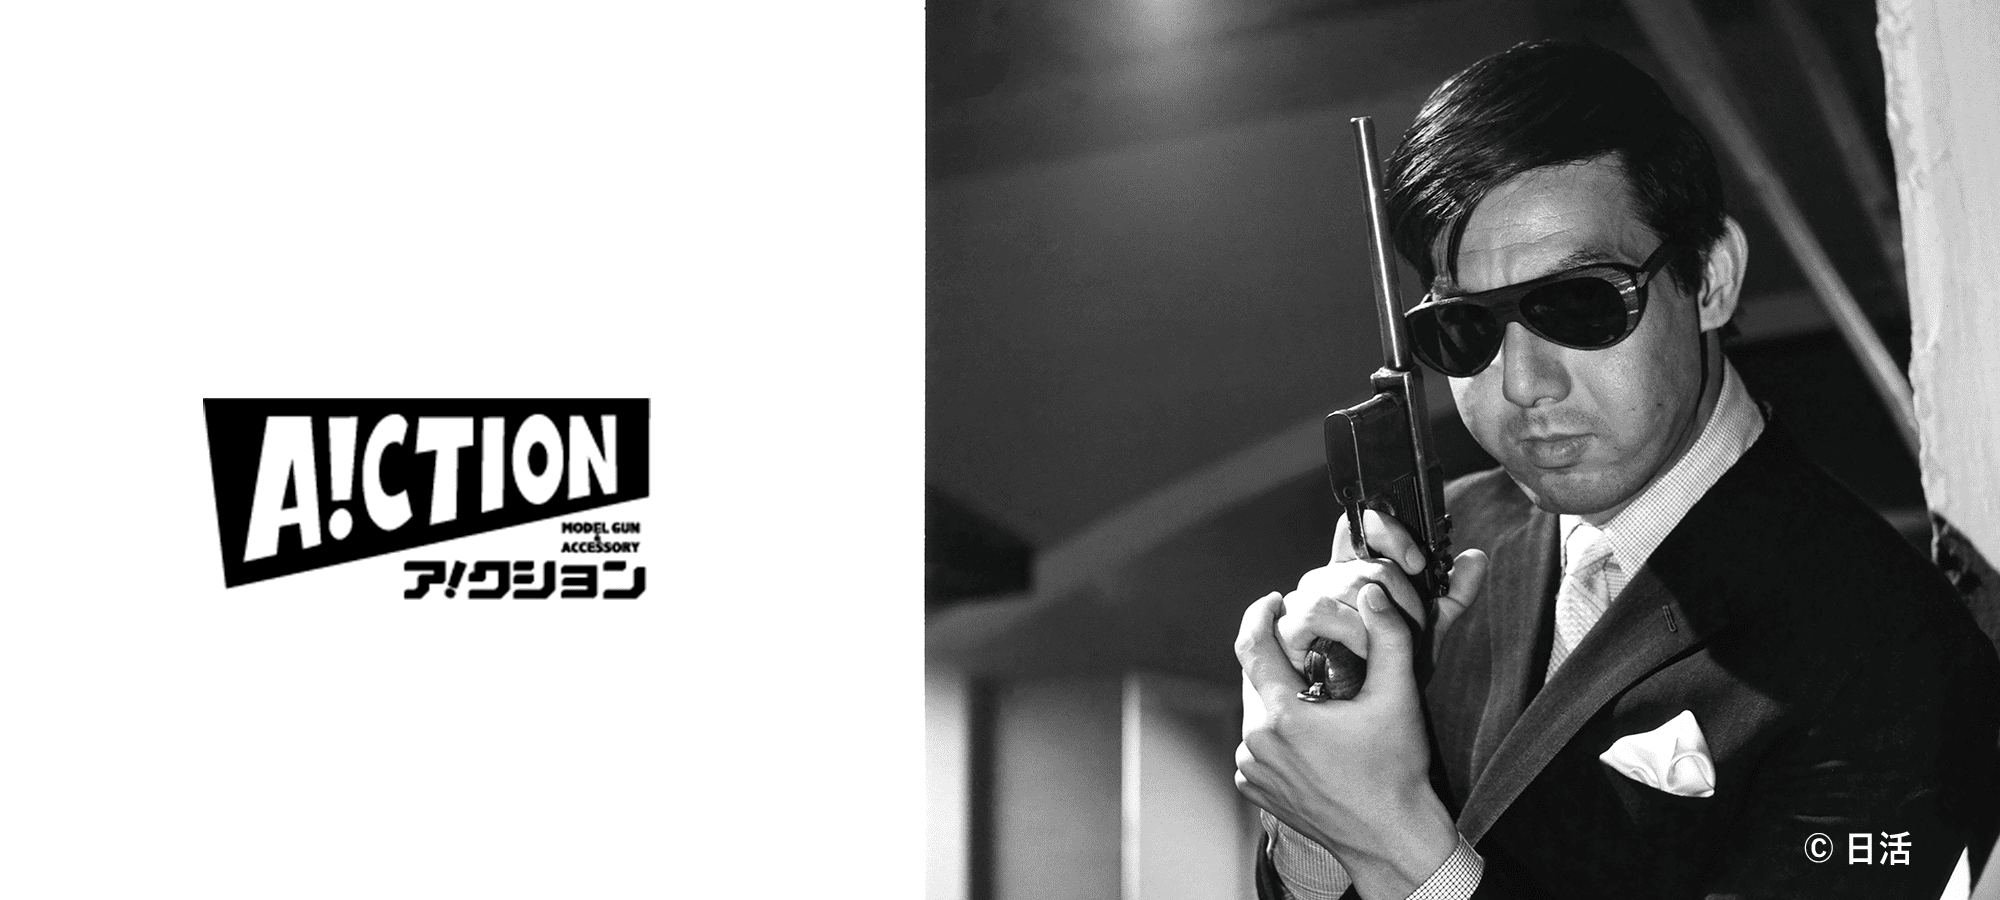 A!CTION第2弾